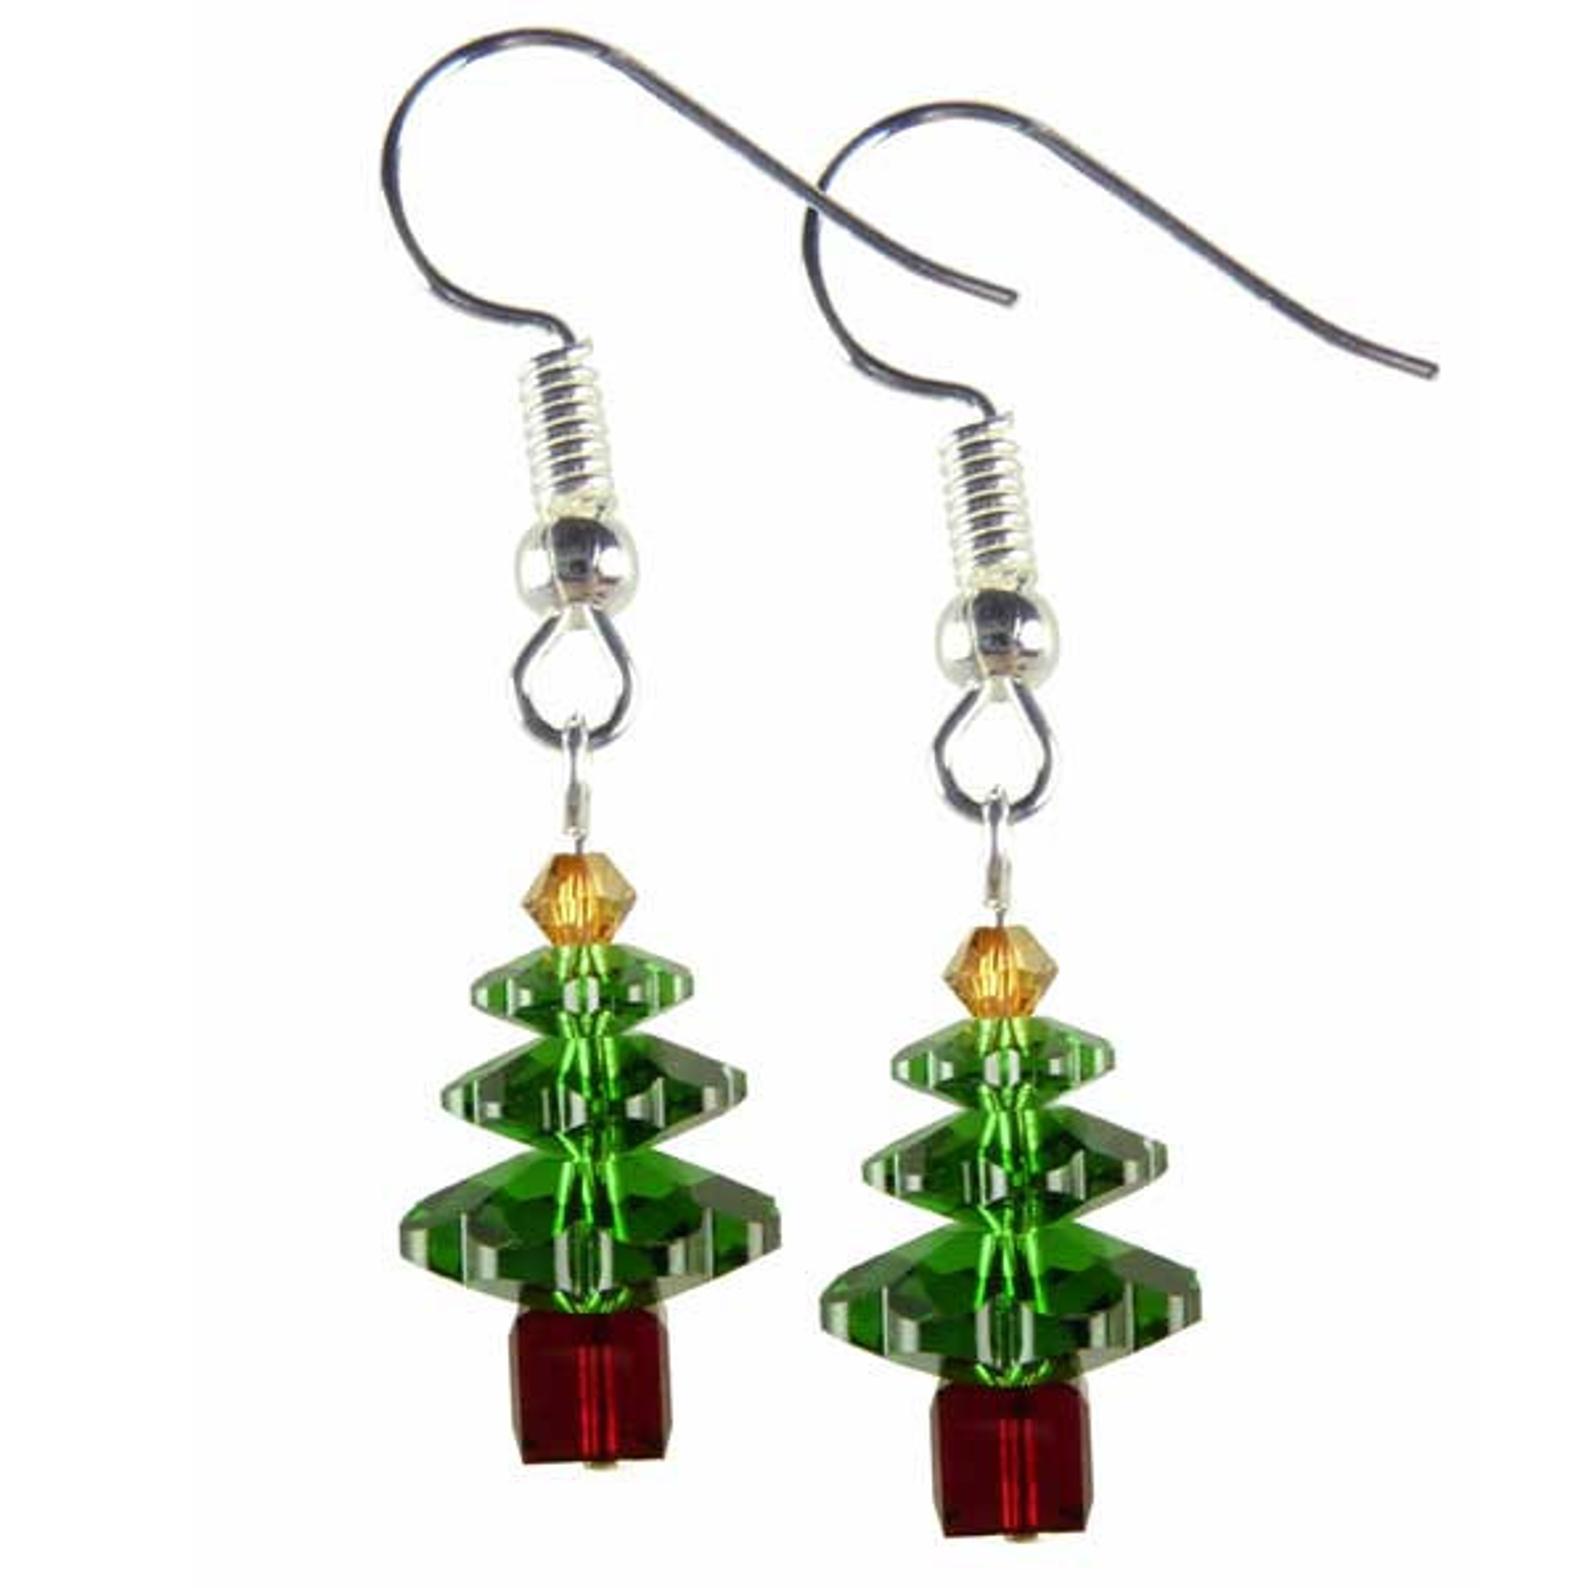 Earrings Design & Making Kits For The Love Of Christmas Gift Giving 2020